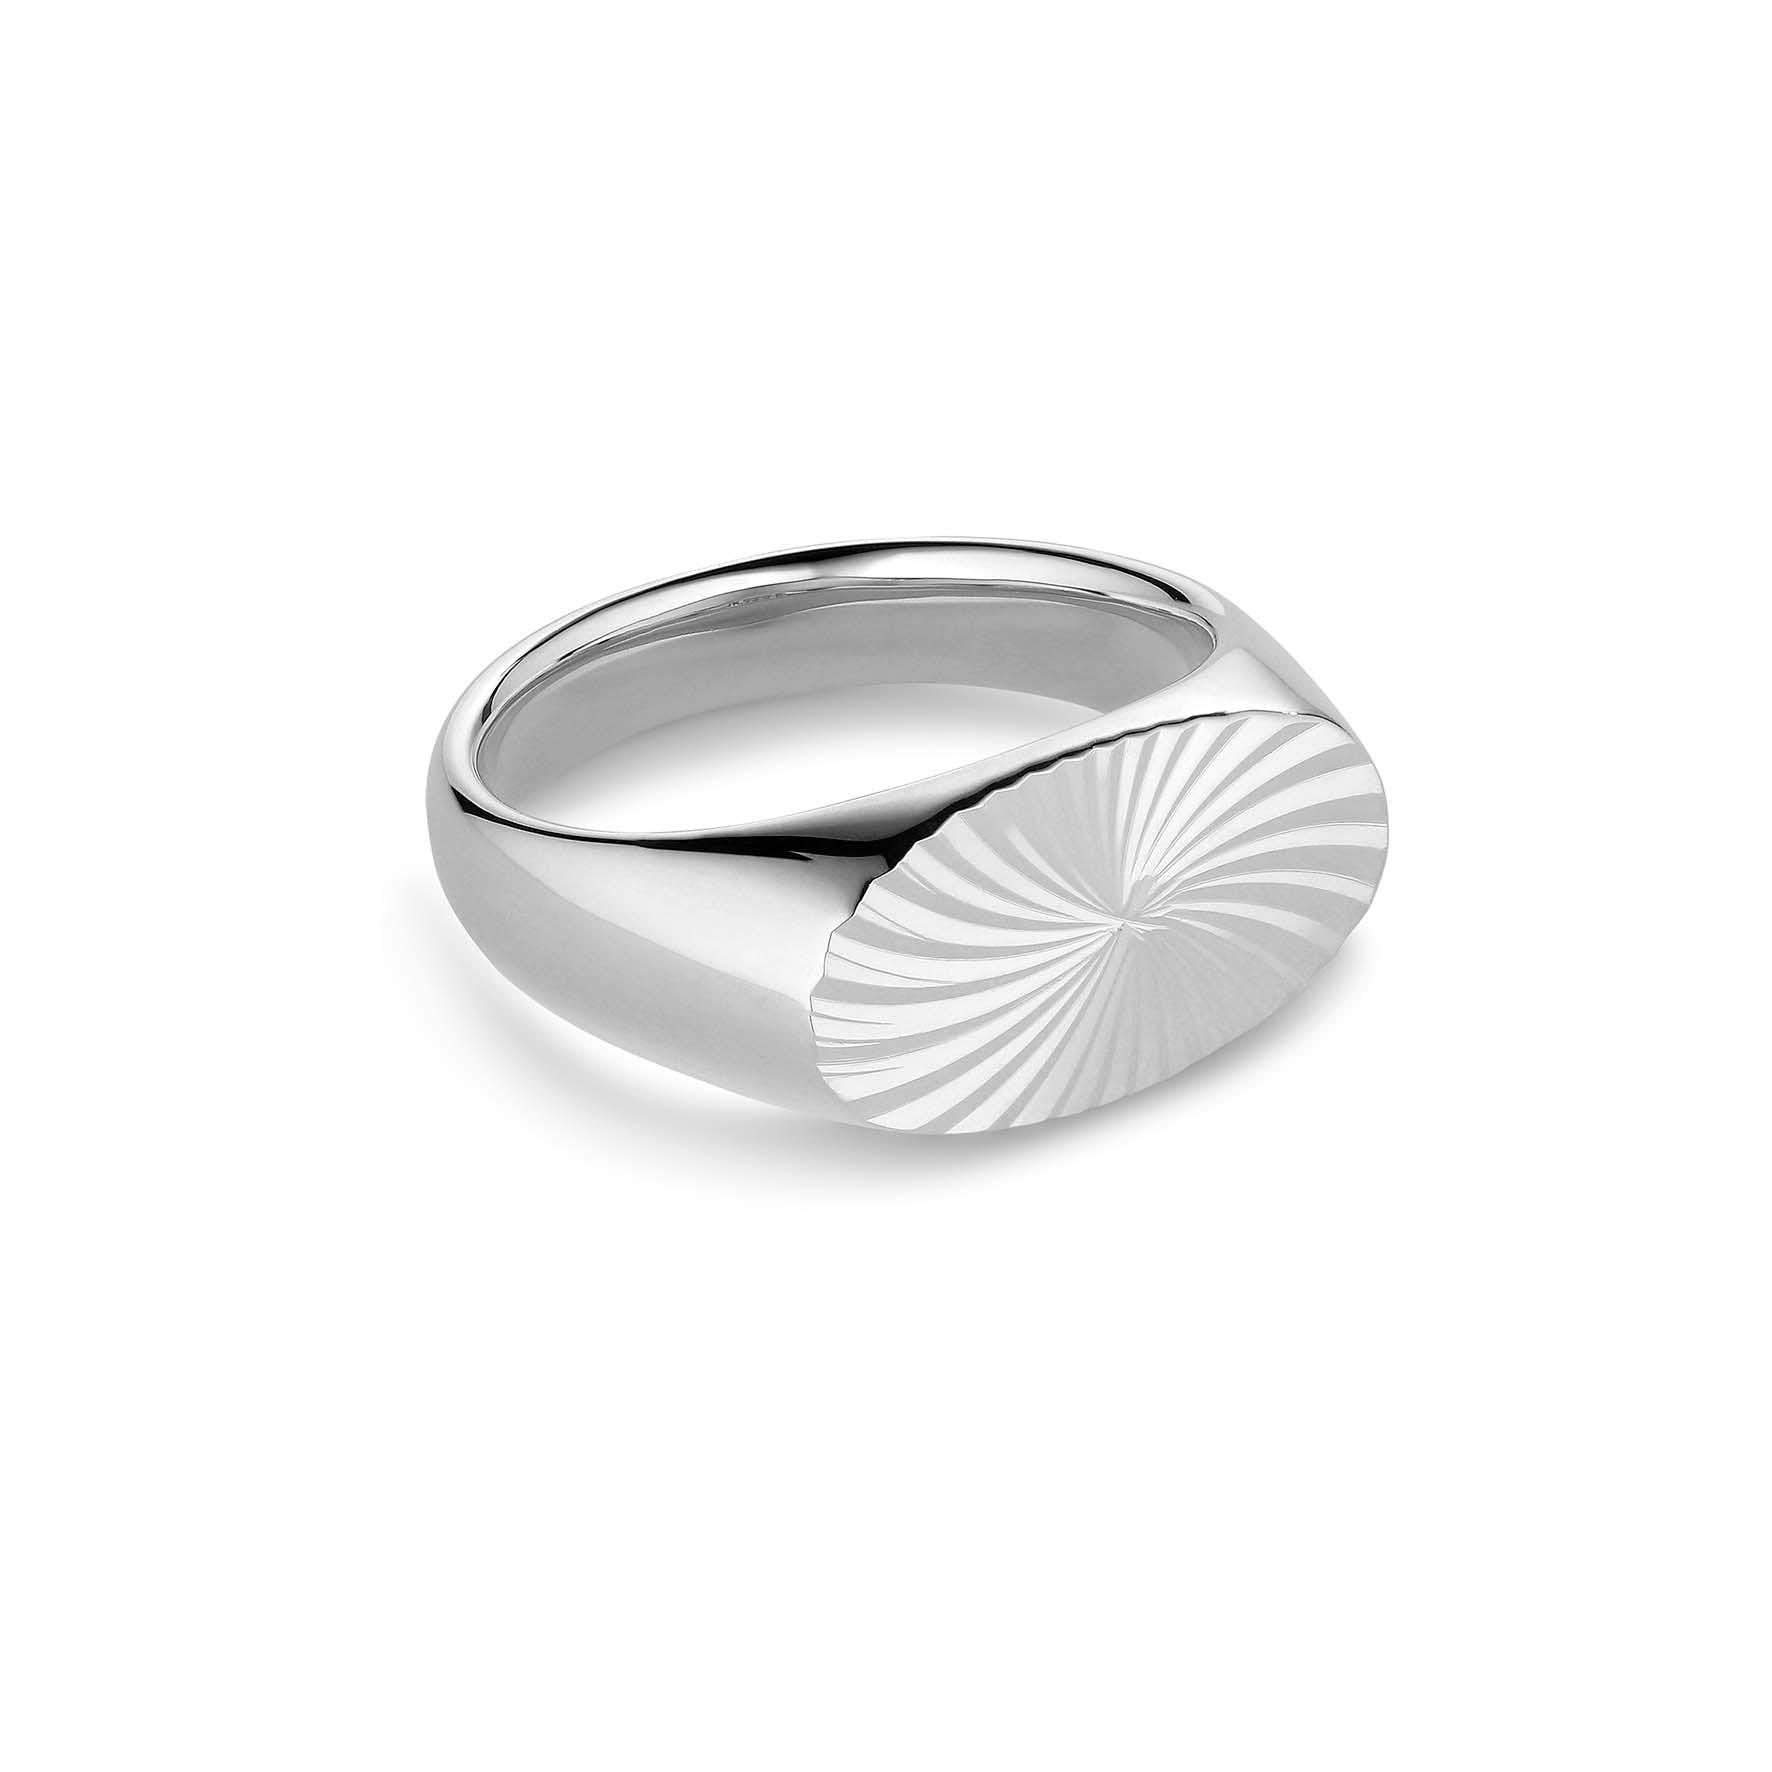 Reflection Signet Ring von Jane Kønig in Silber Sterling 925